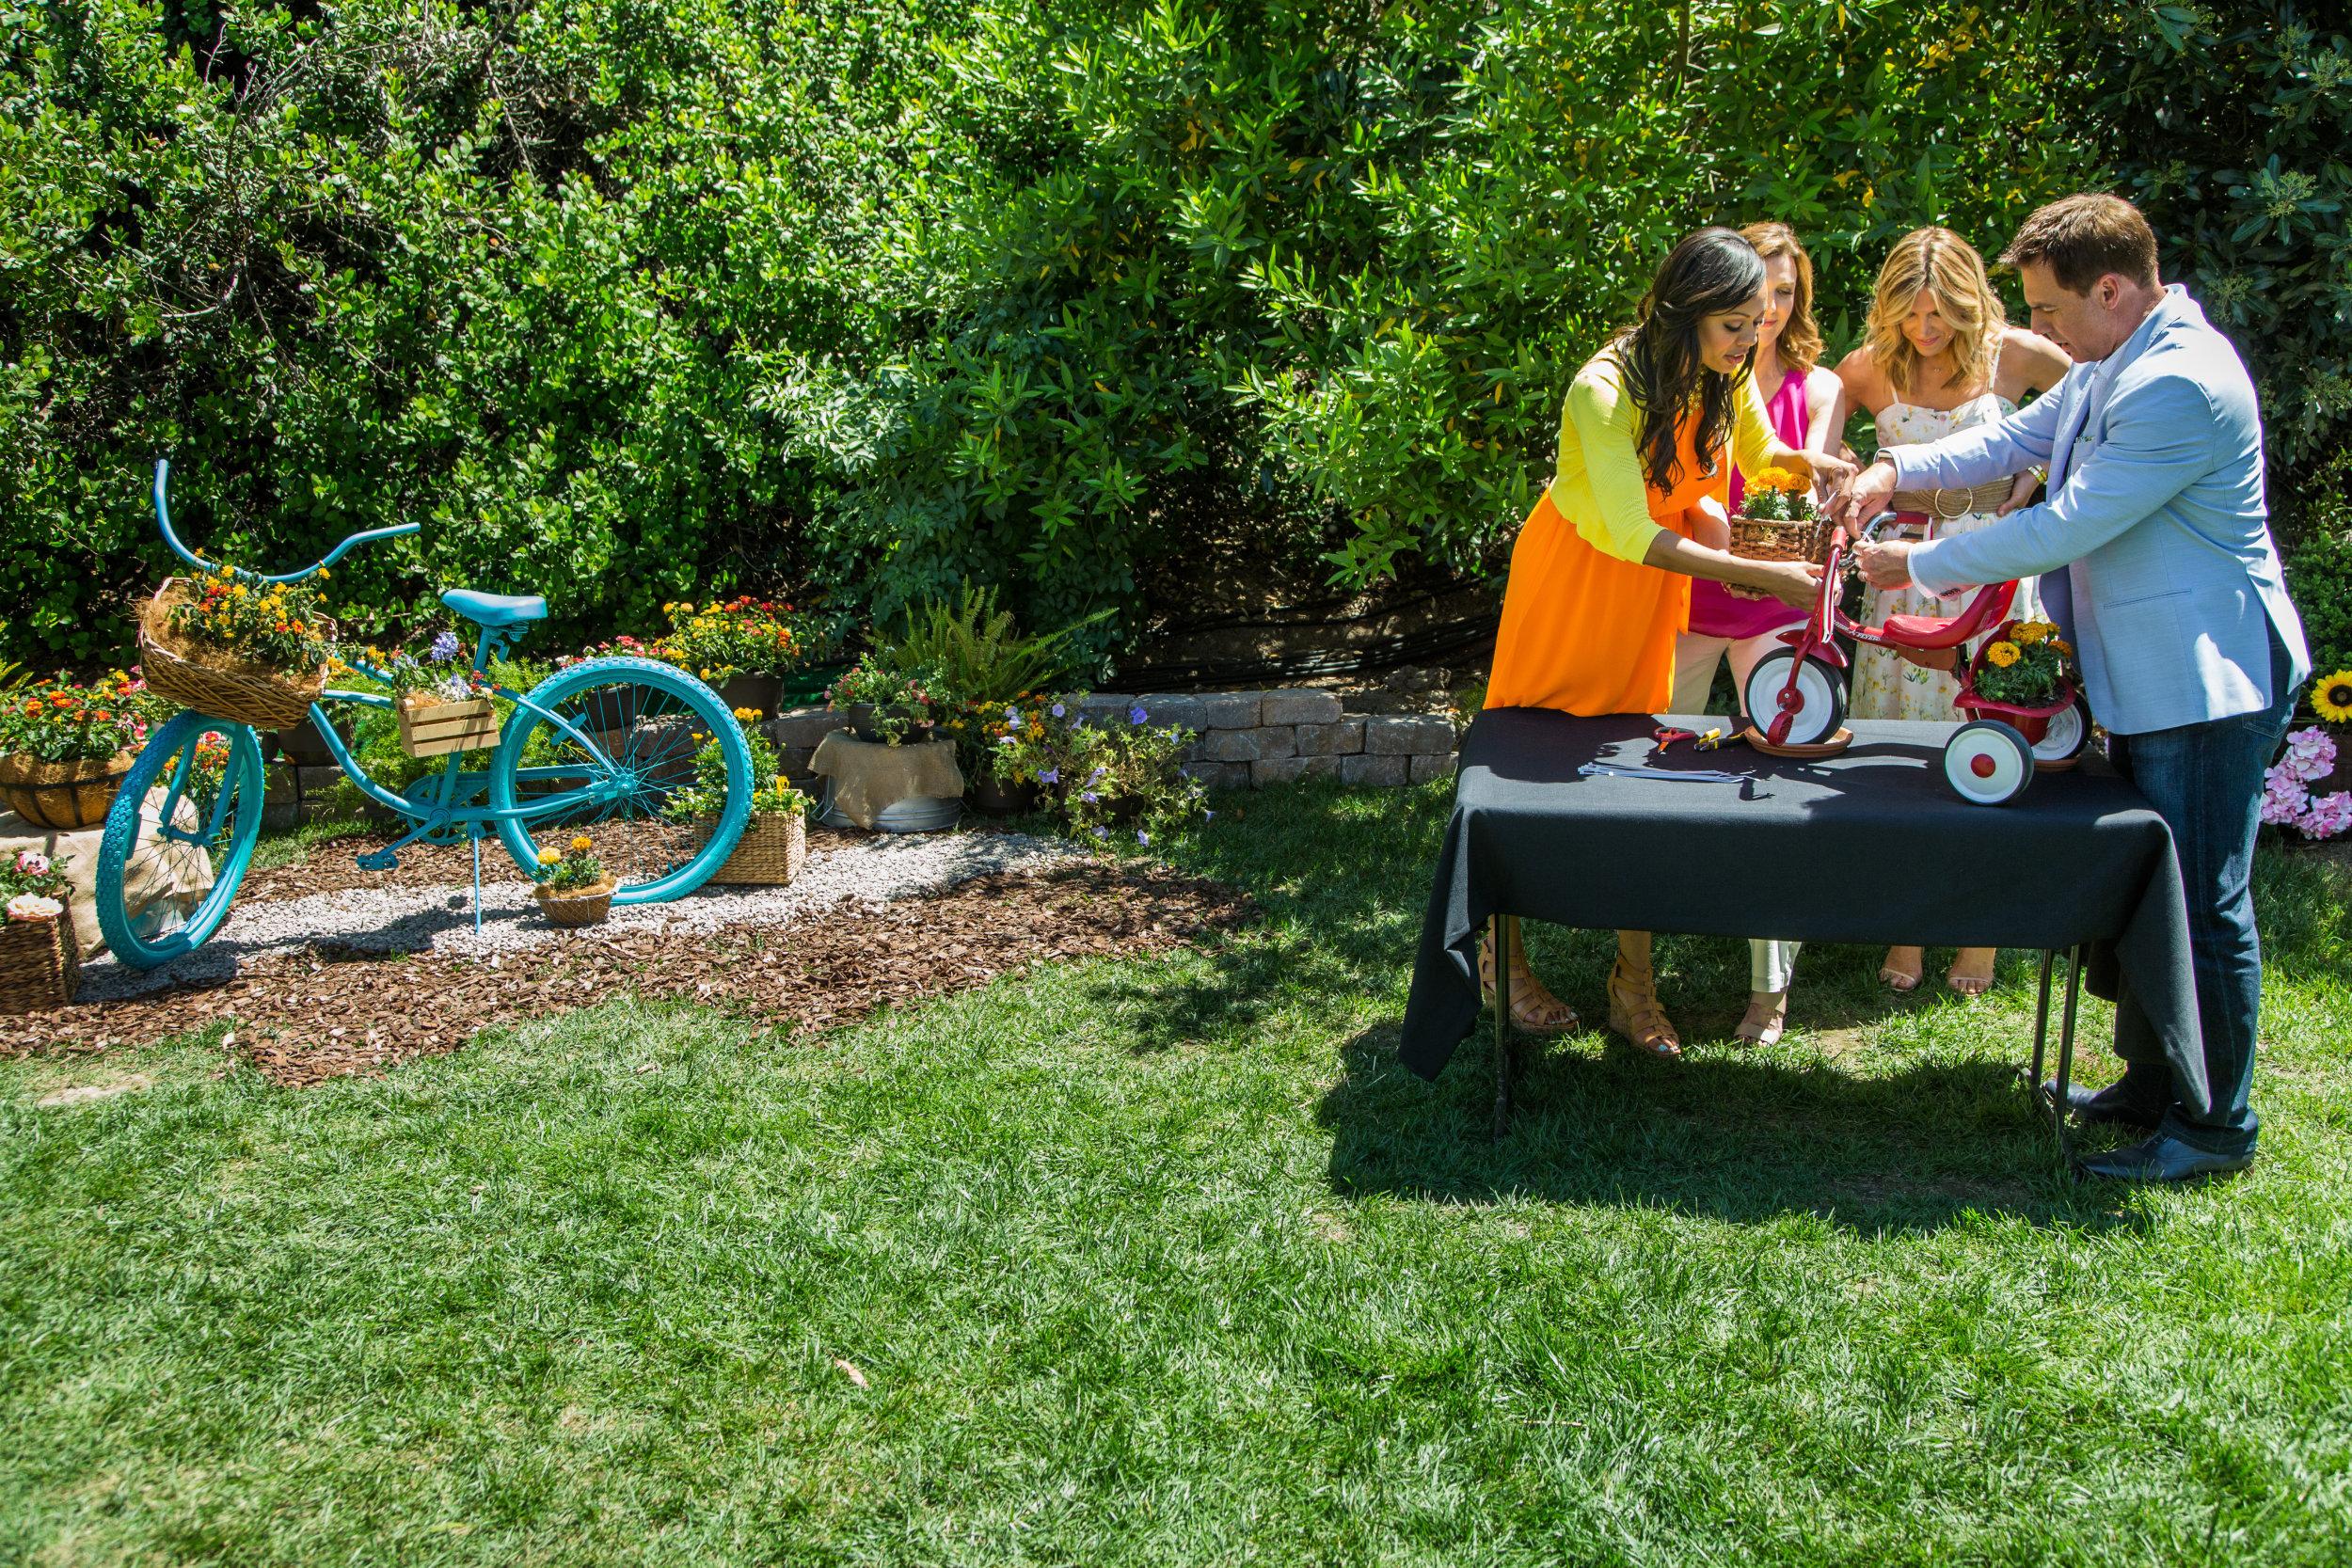 Diy Trike And Bike Garden Home Family Video